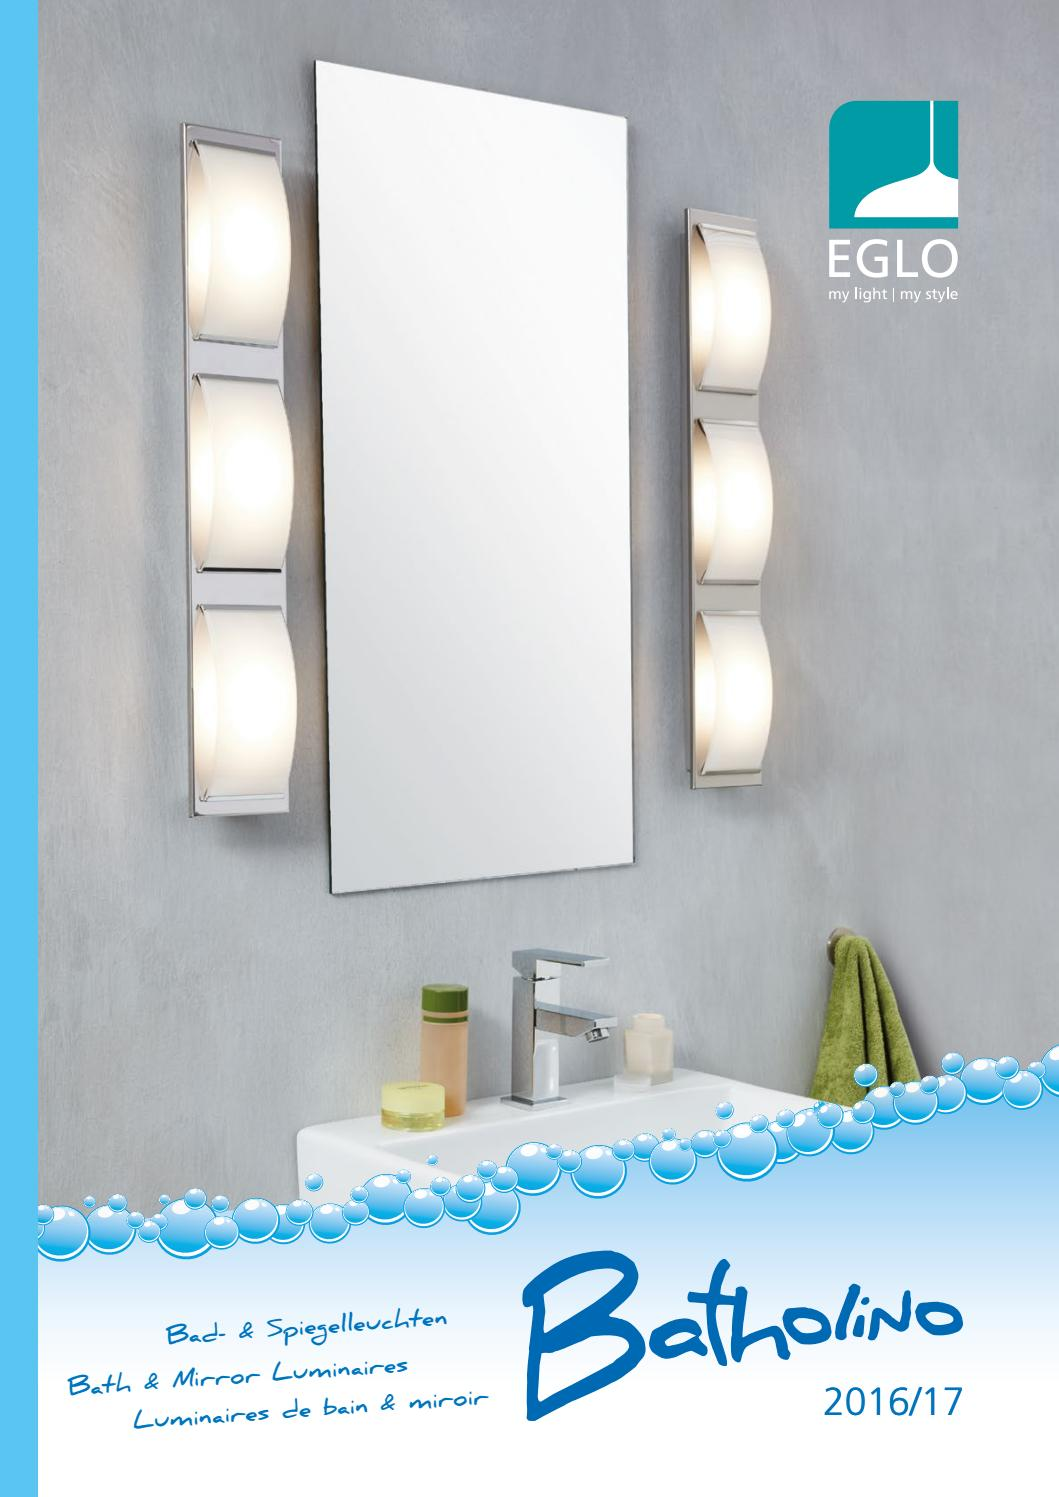 Eglo 94614 Tabiano DEL miroir lampe 2 x 32 W Acier Nickel-Mat Plastique Weis